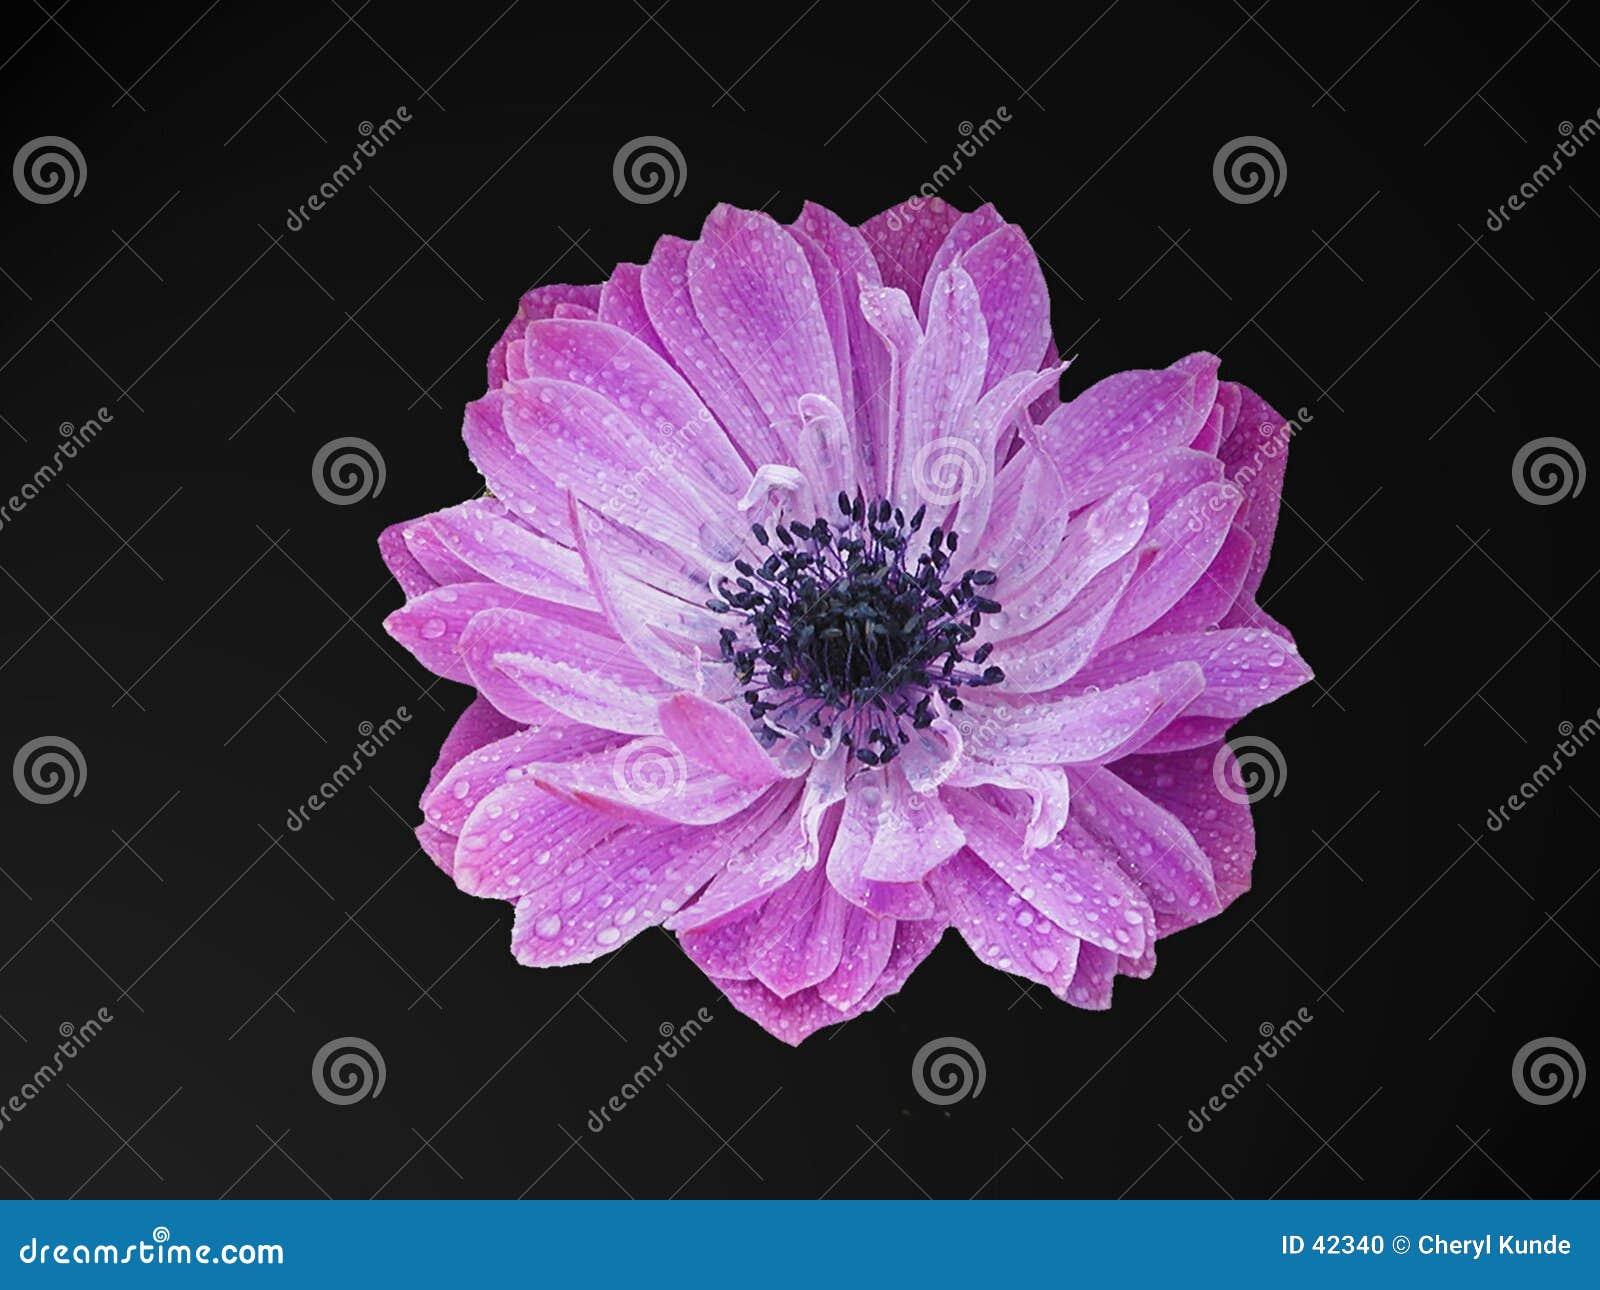 Fioletowy kwiat głowy